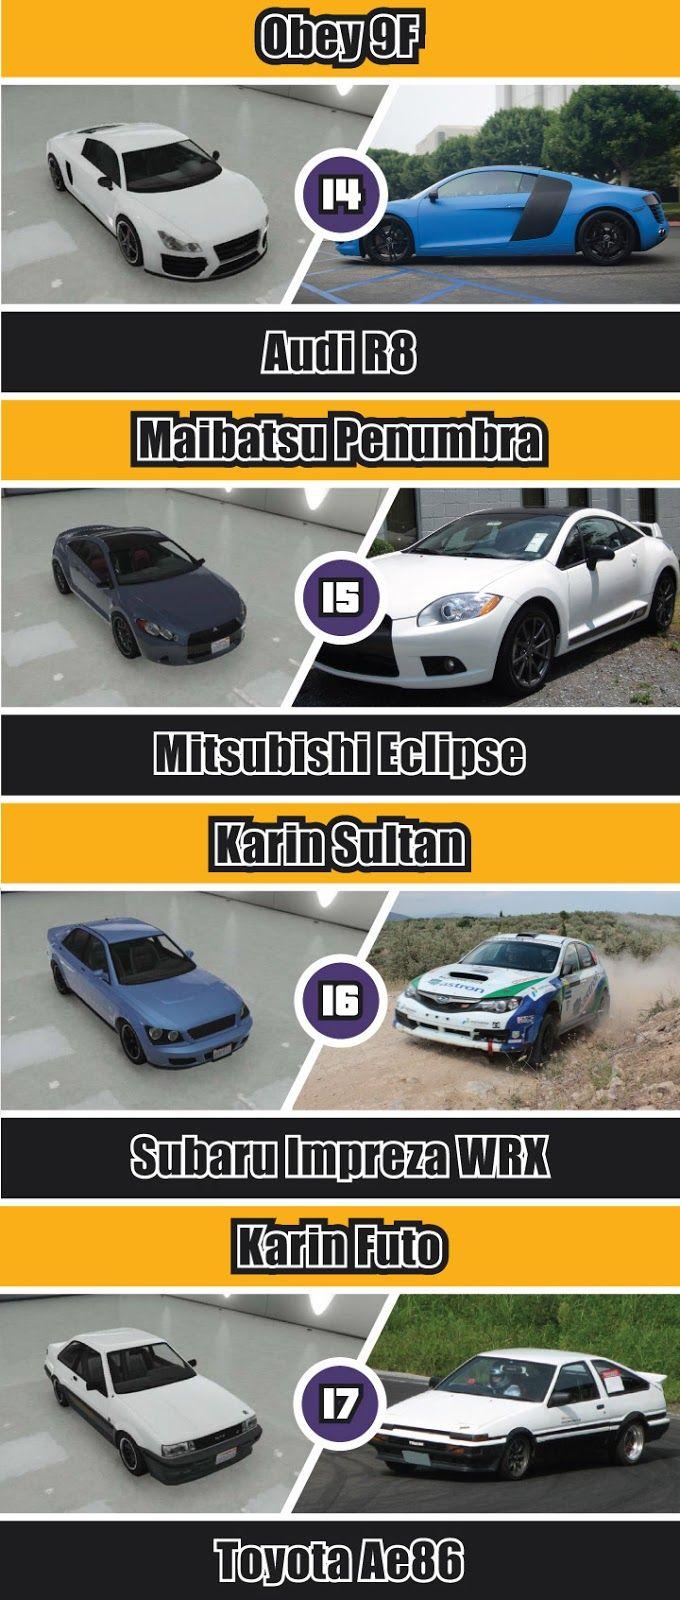 Google chrome theme gta v - Gta V Cars And Their Real Life Counterparts Infographic